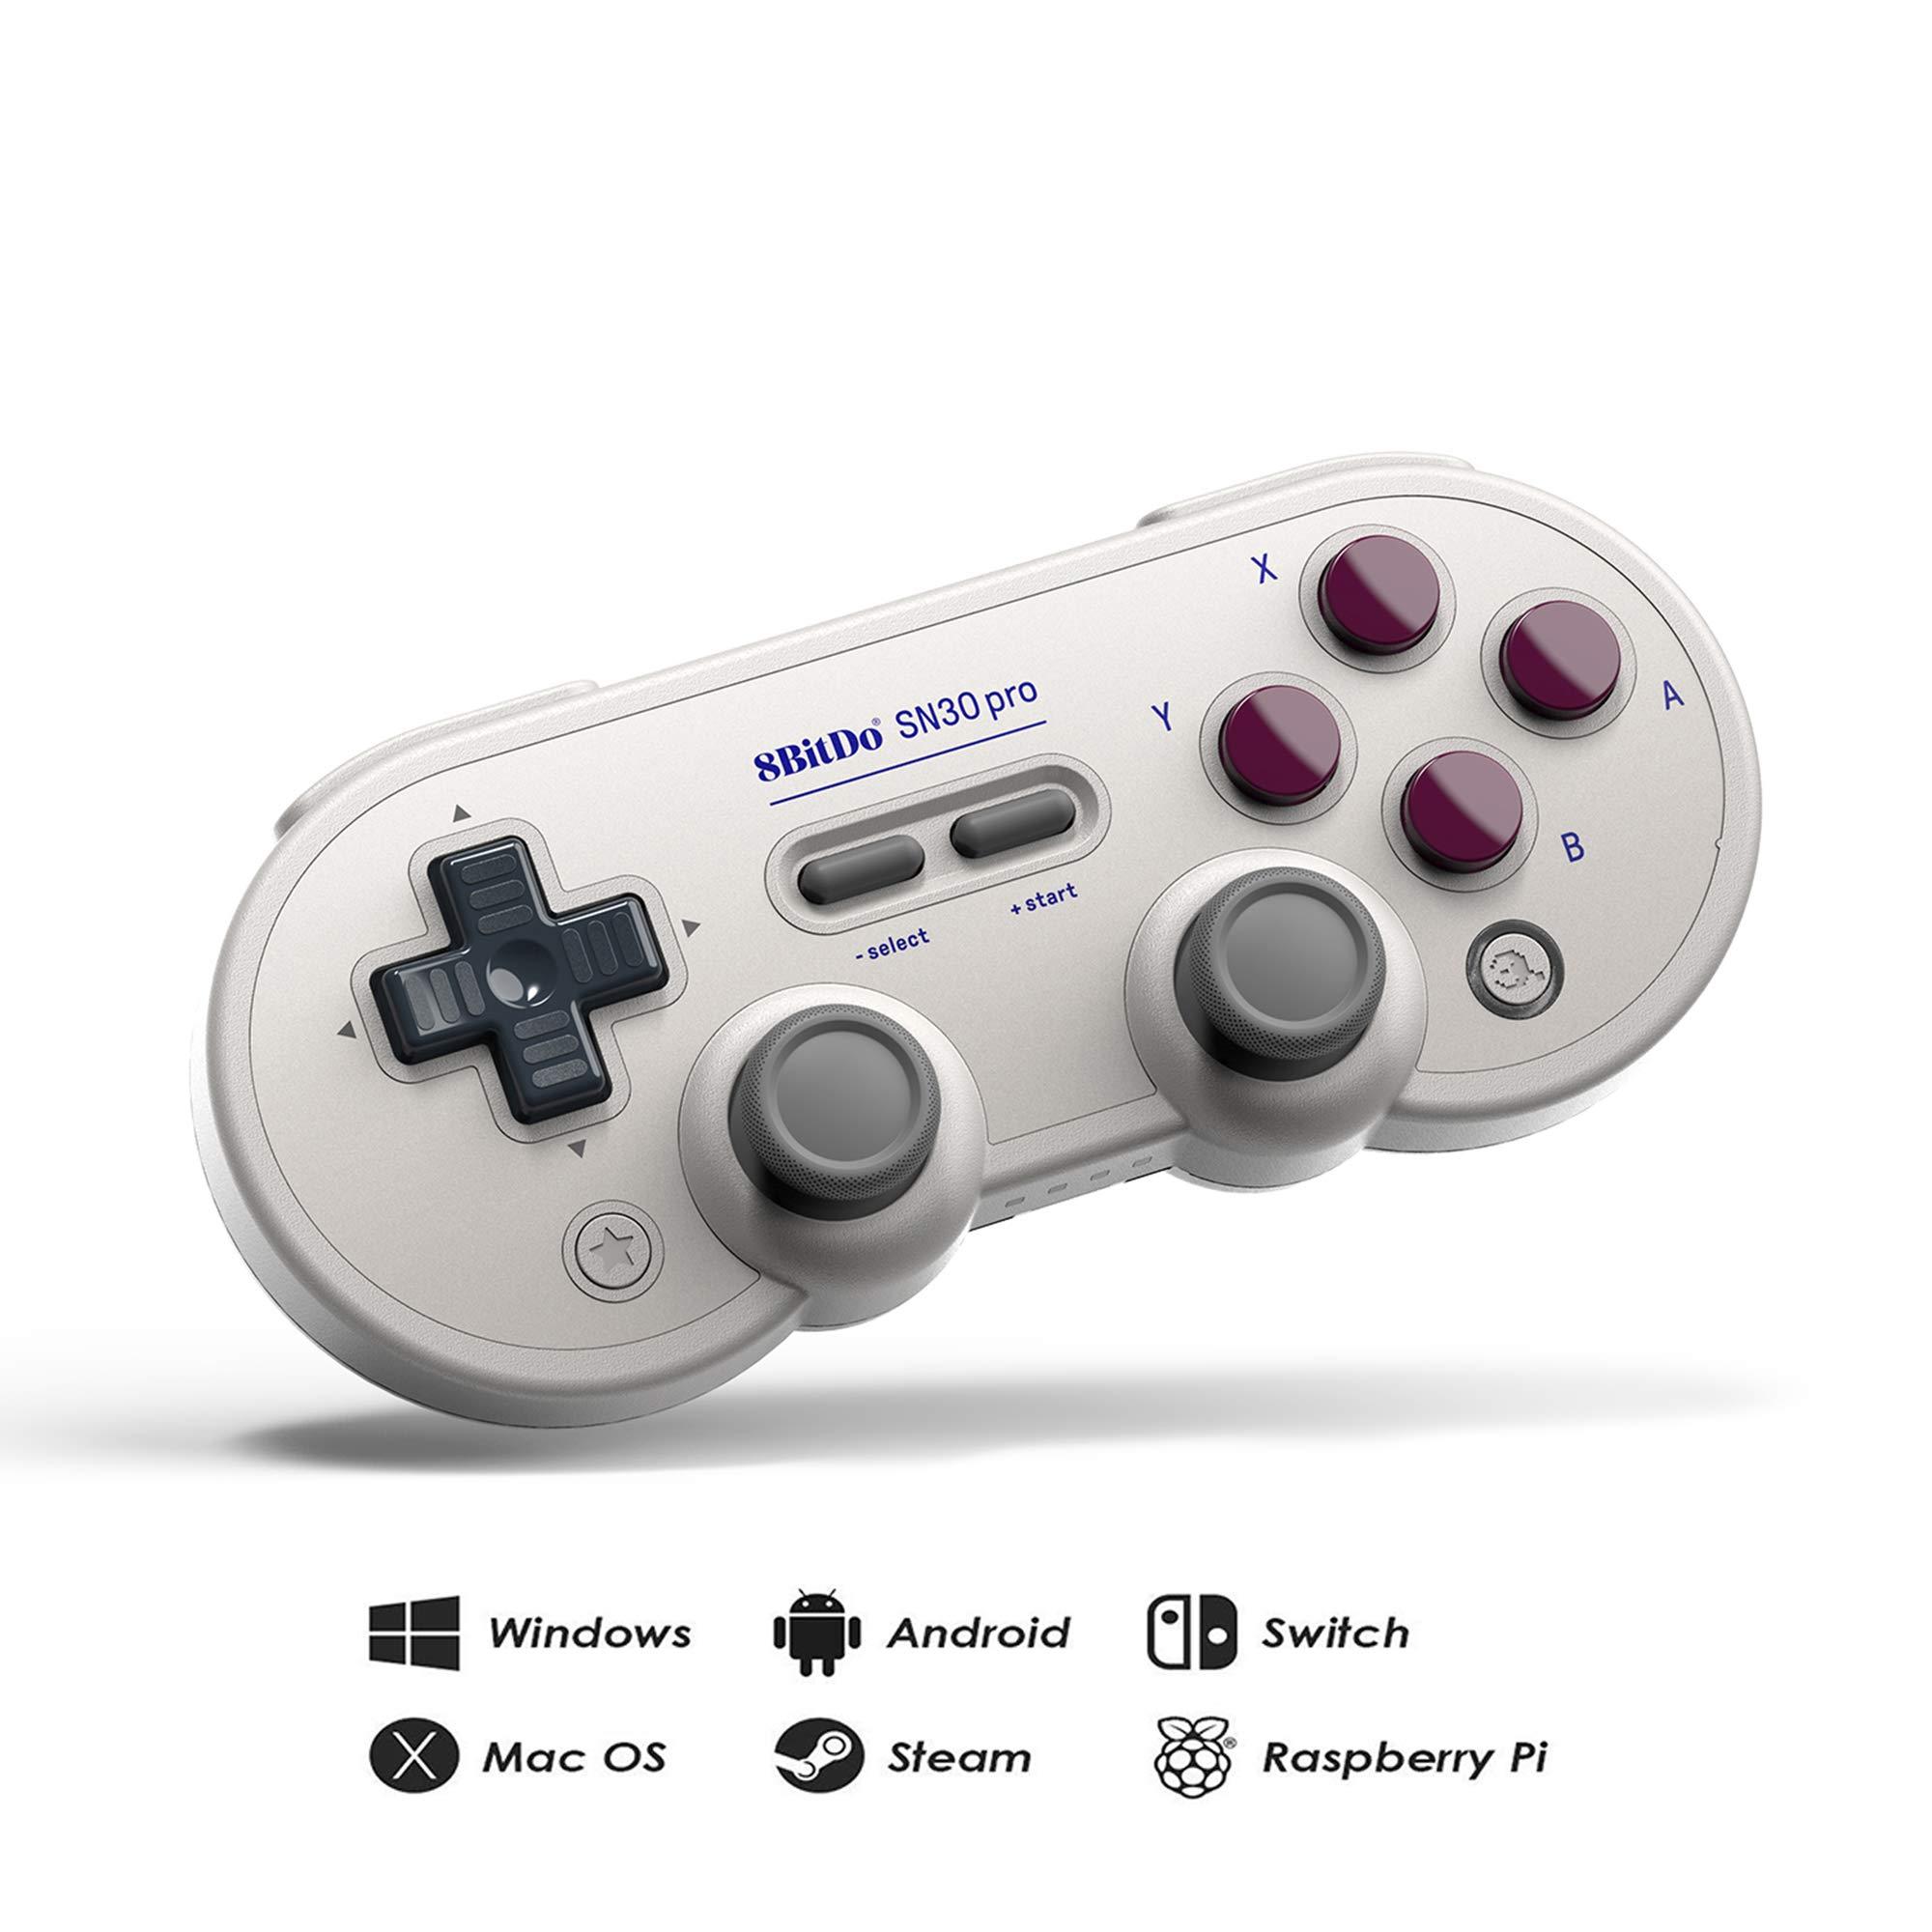 RunSnail 8Bitdo Sn30 Pro Bluetooth Gamepad (G Classic Edition) with Joysticks Rumble Vibration Gamepad for Windows, Mac OS, Android, Steam, Nintendo Switch, etc